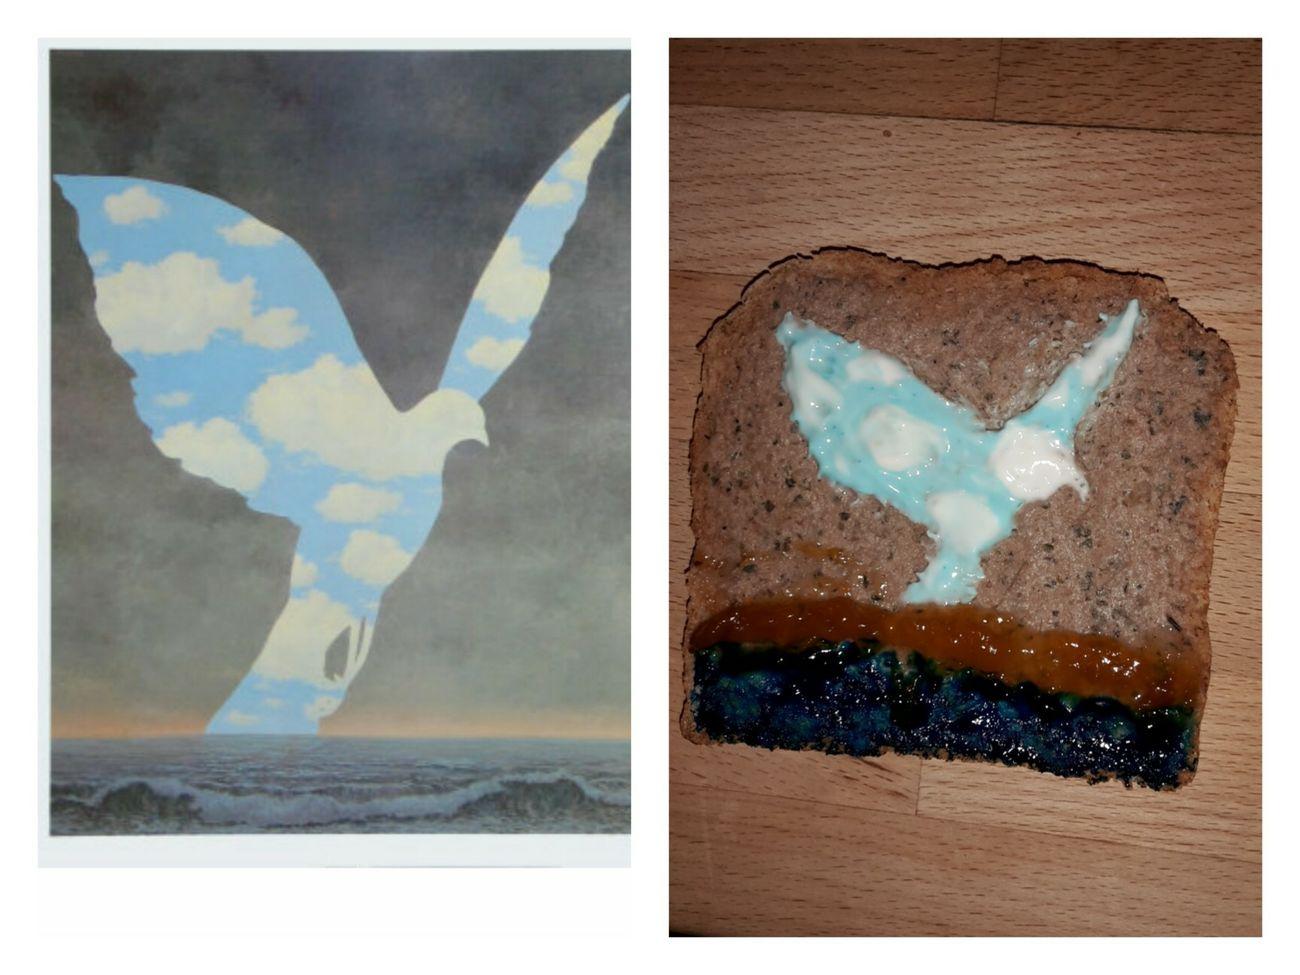 Rene Magritte Friedenstaube Art On A Toast Selfmade